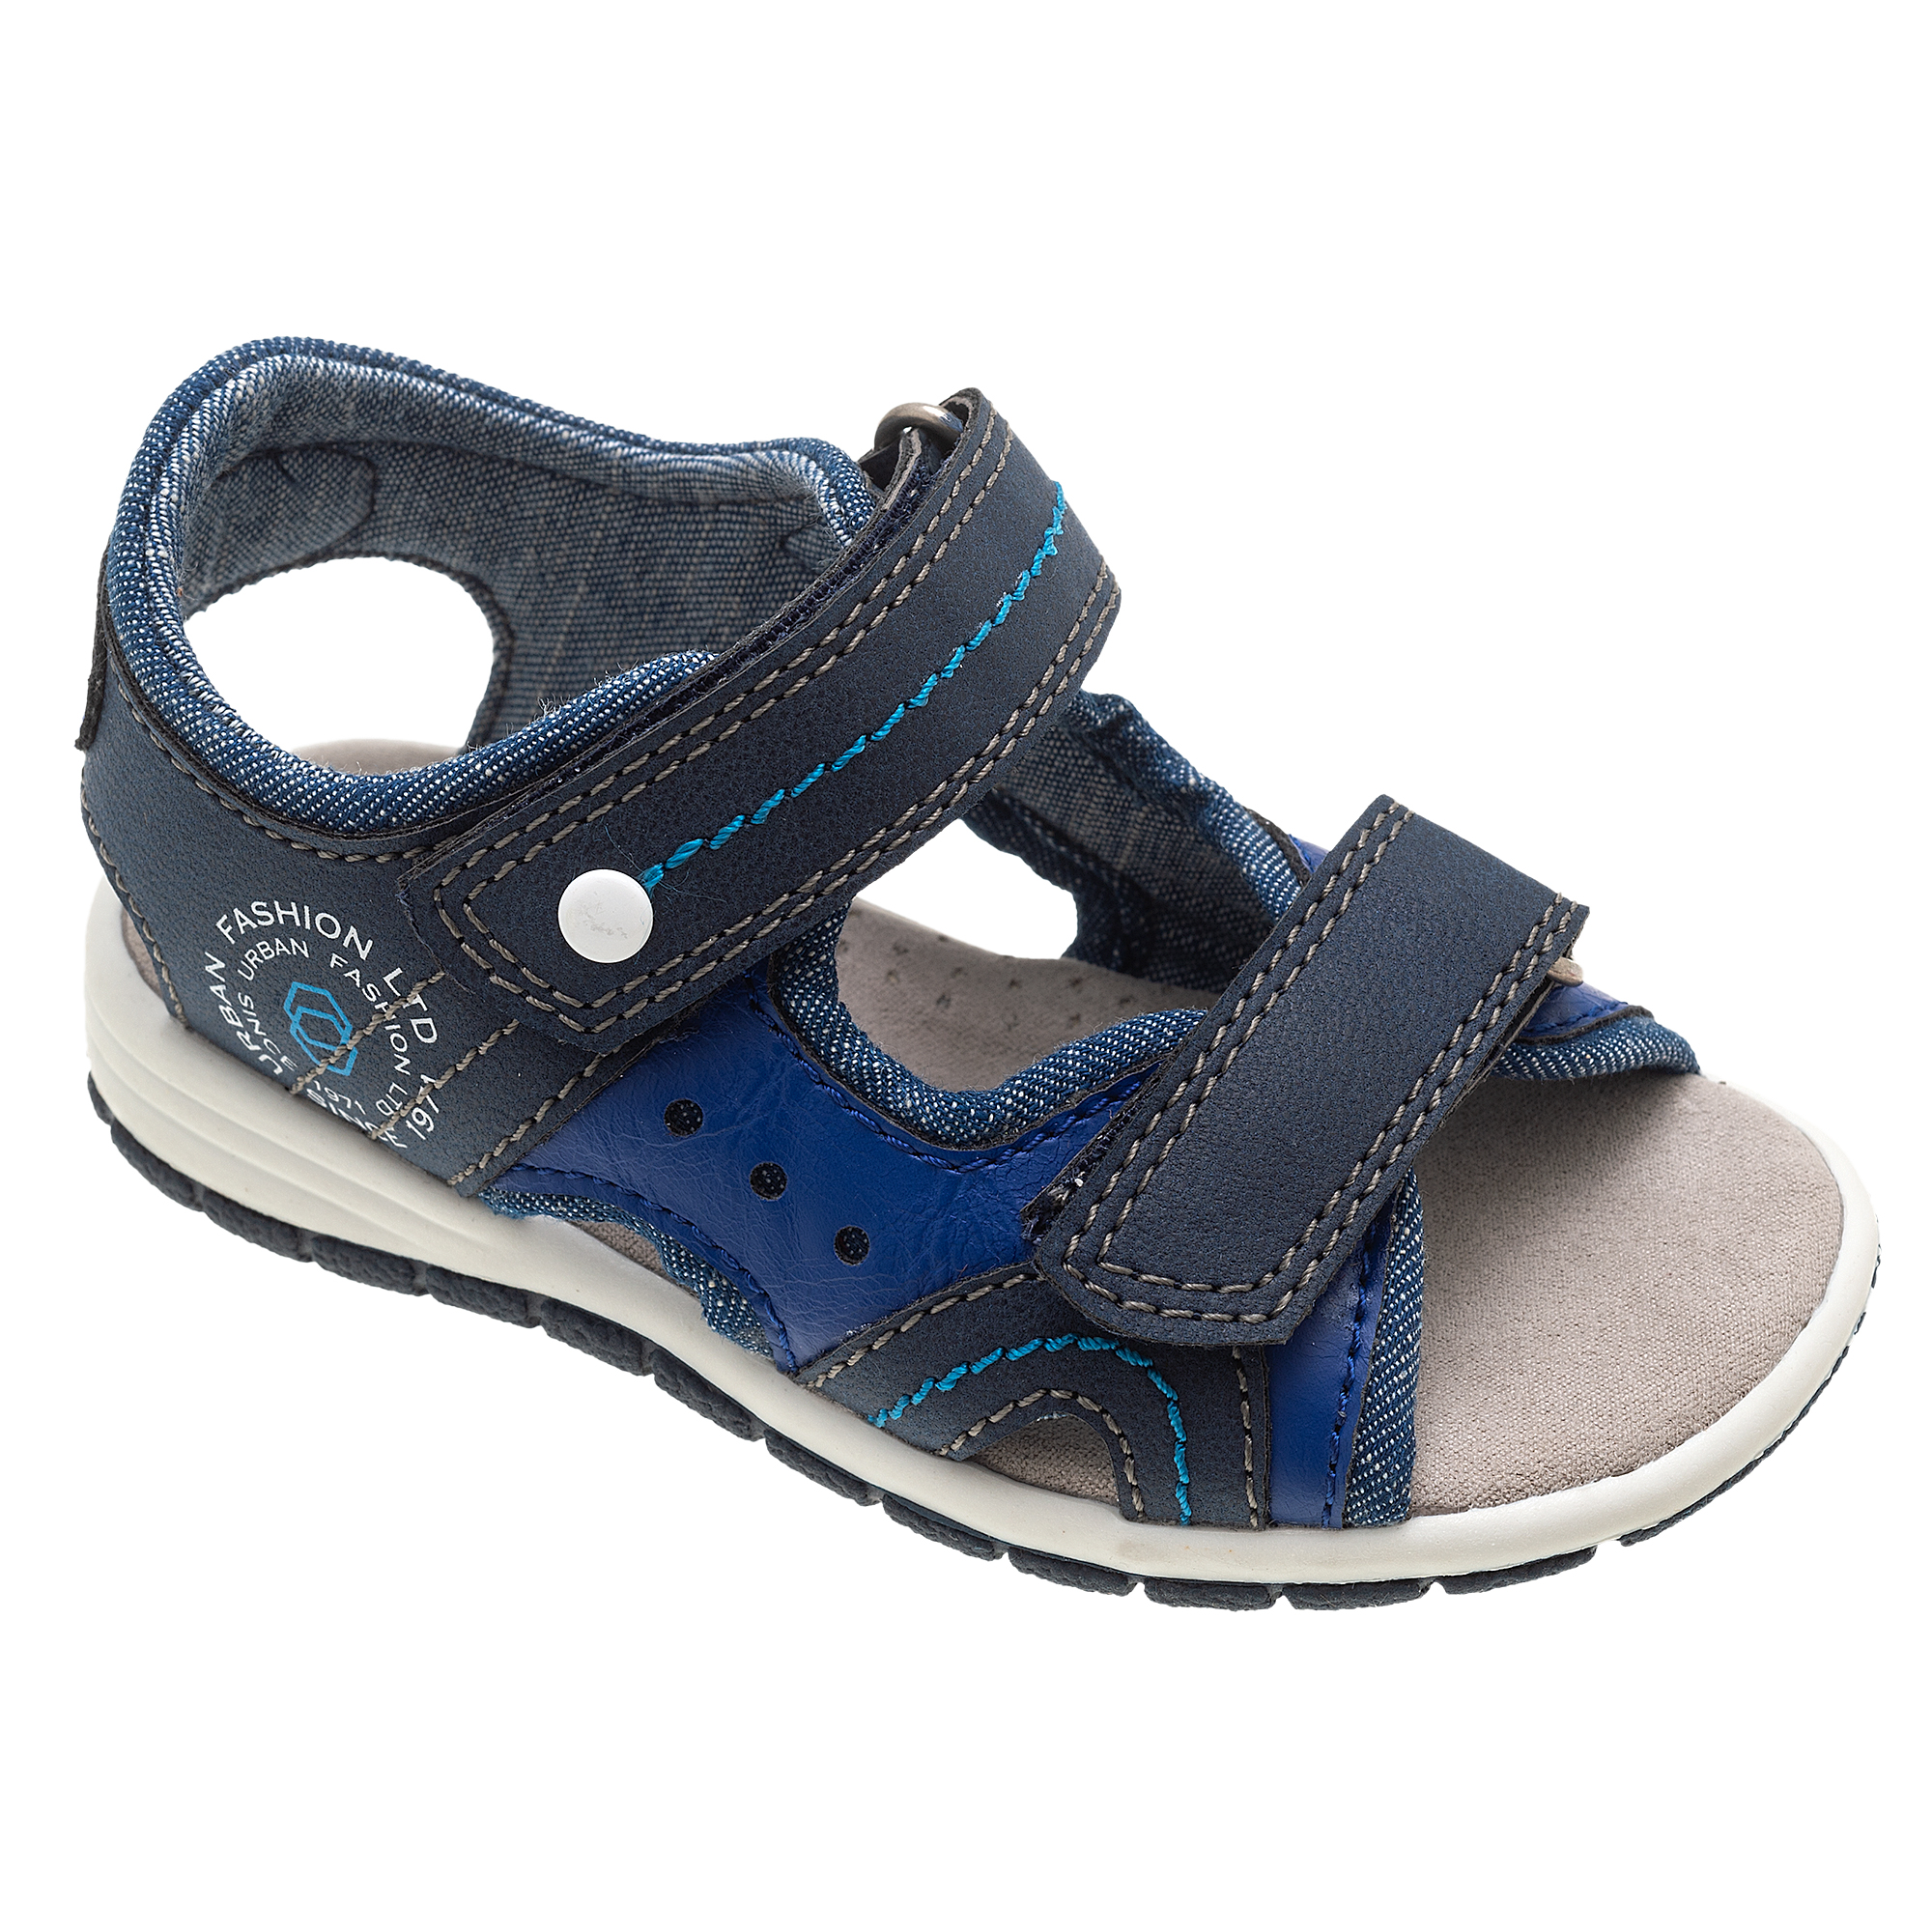 Sandalute Copii Chicco Fester, Albastru Inchis, 61691 imagine